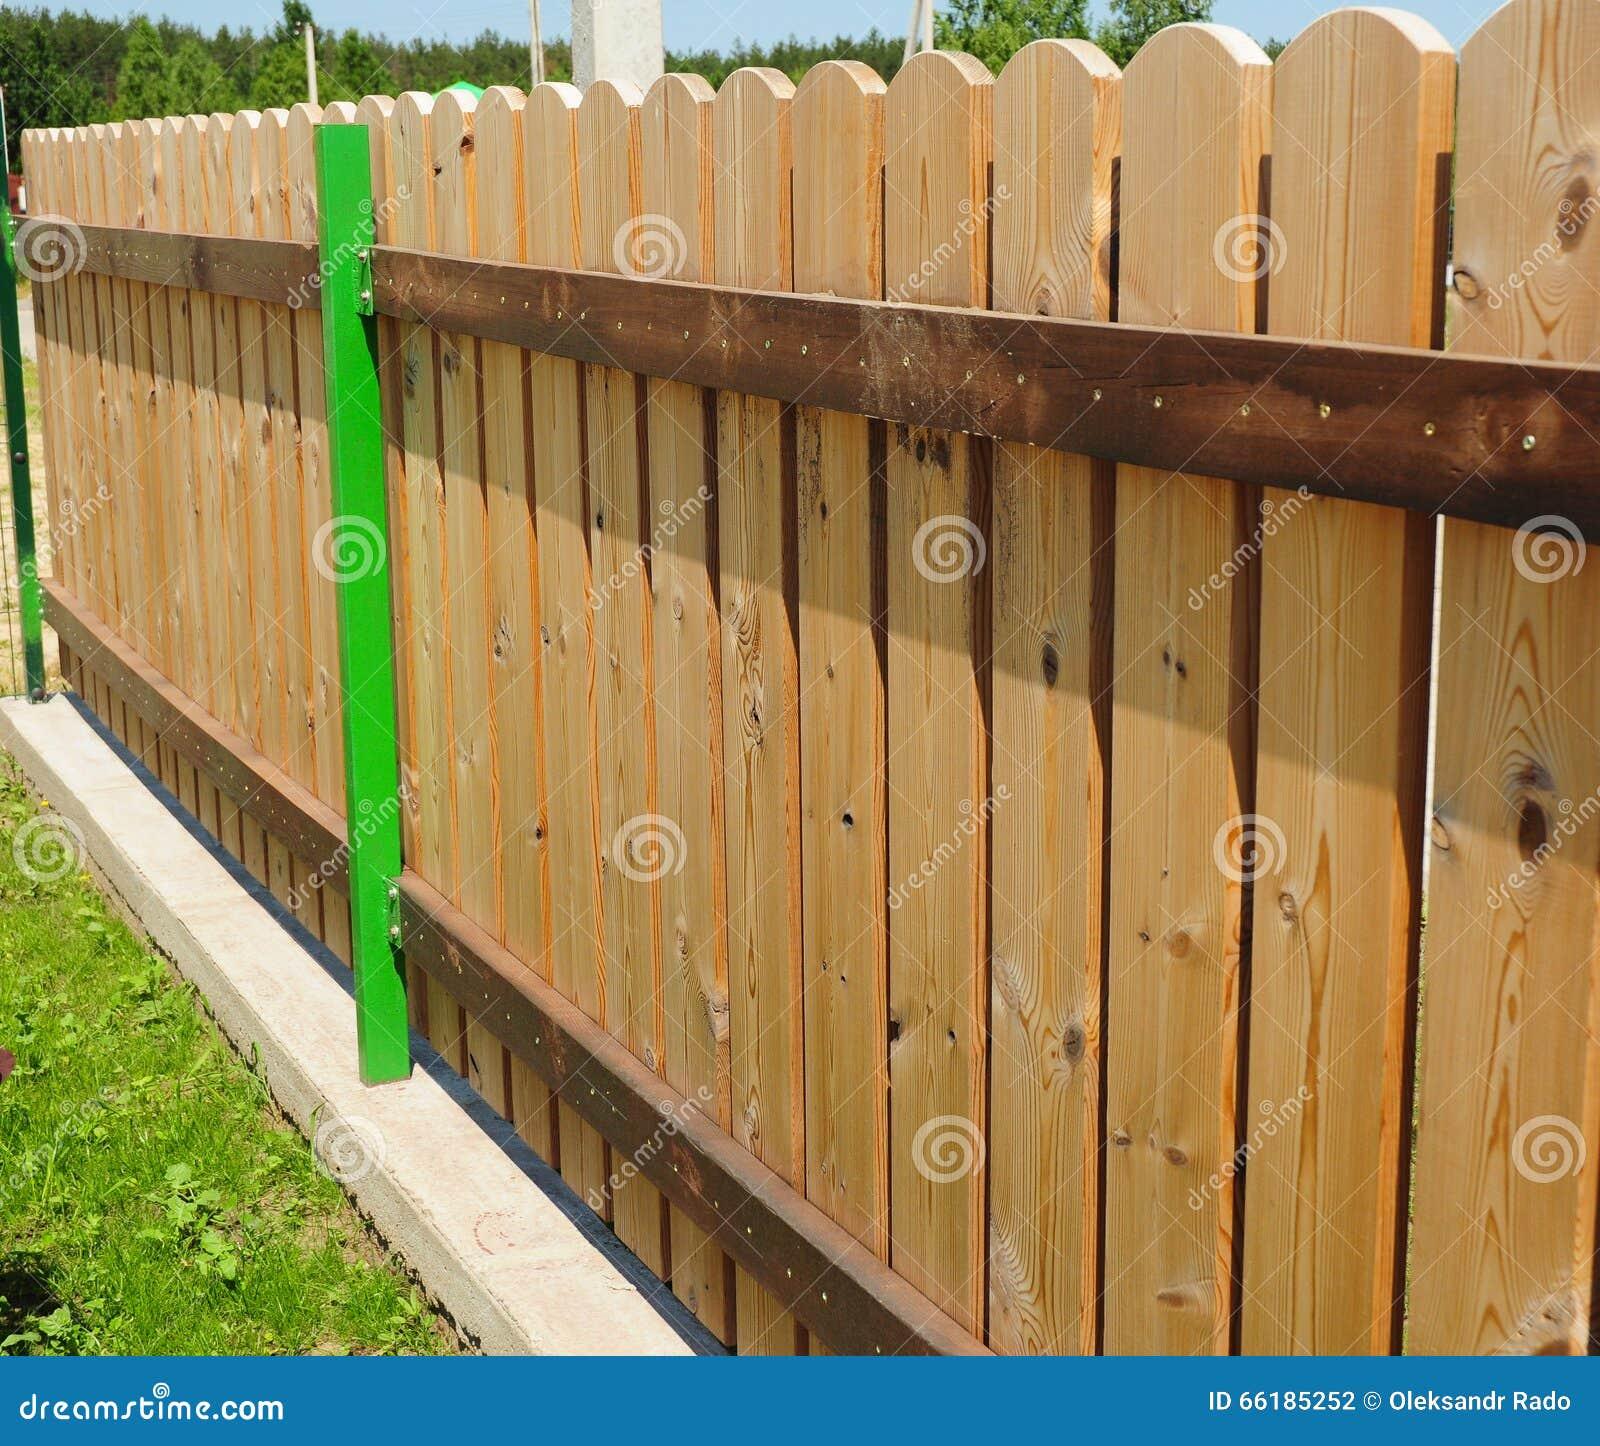 Wood Picket Fence Details Stock Photo Image Of Gardening